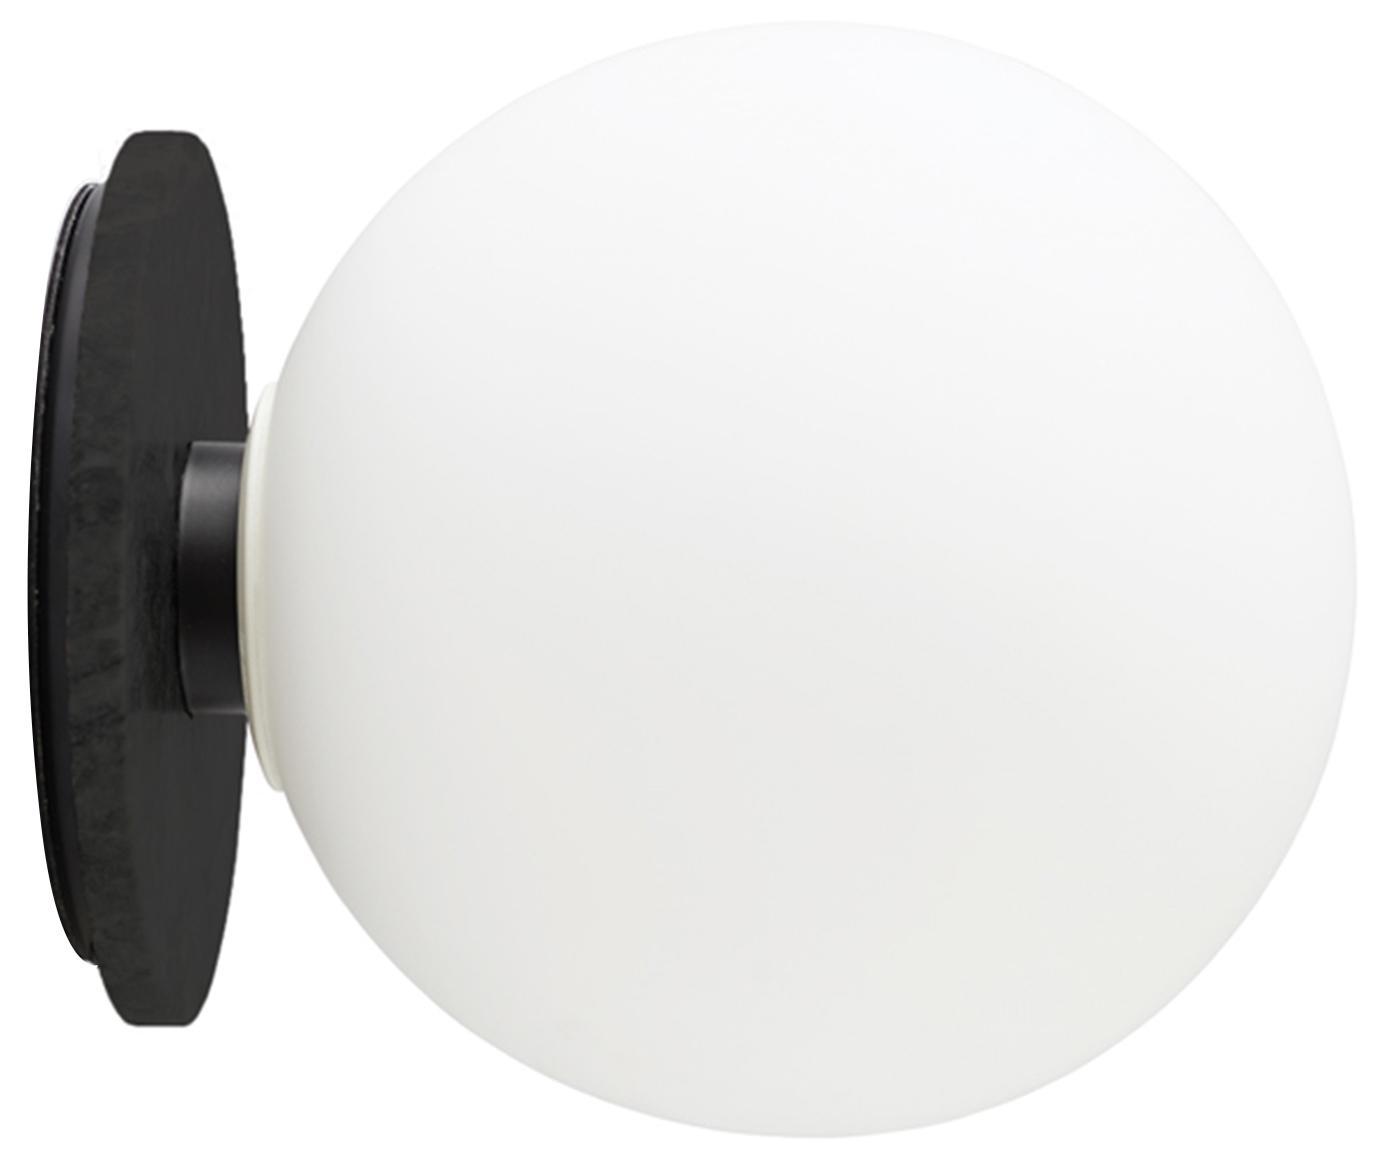 Plafón / Aplique LED TR Bulb, Pantalla: vidrio opalino, Blanco, negro, Ø 20 x F 22 cm